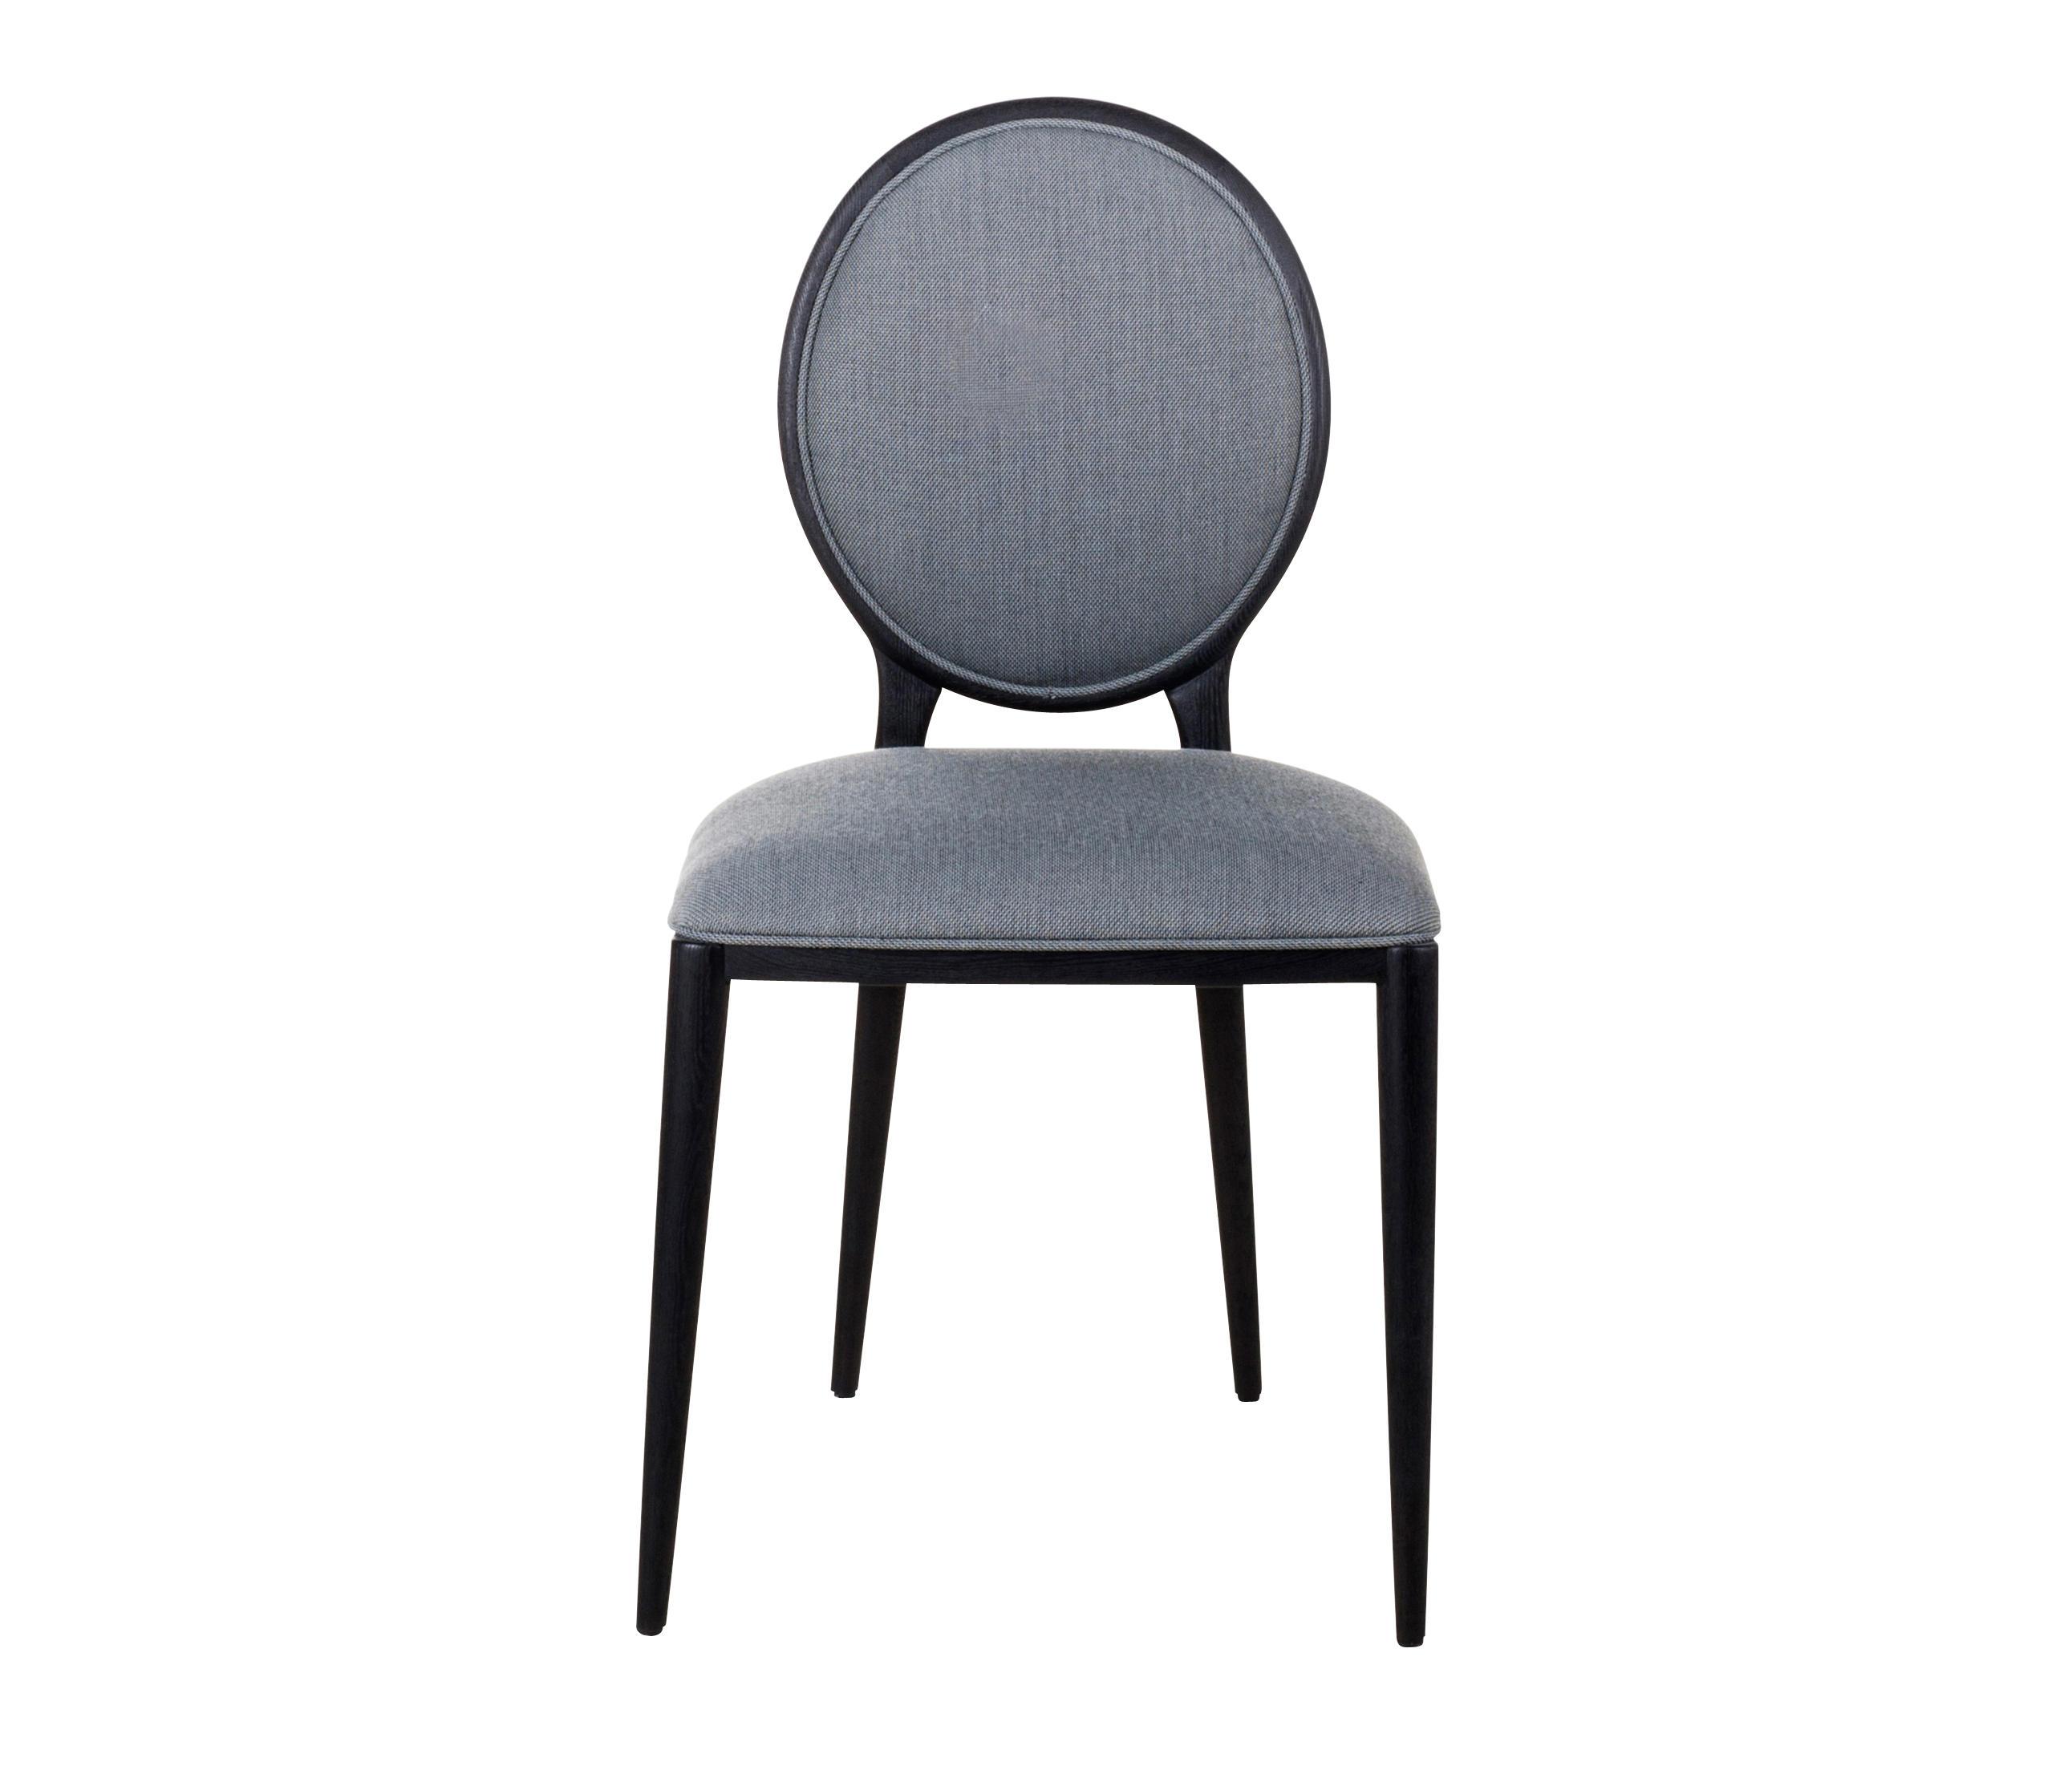 chaise baroque pas cher free charmant salon baroque pas cher avec chaise salon images with. Black Bedroom Furniture Sets. Home Design Ideas